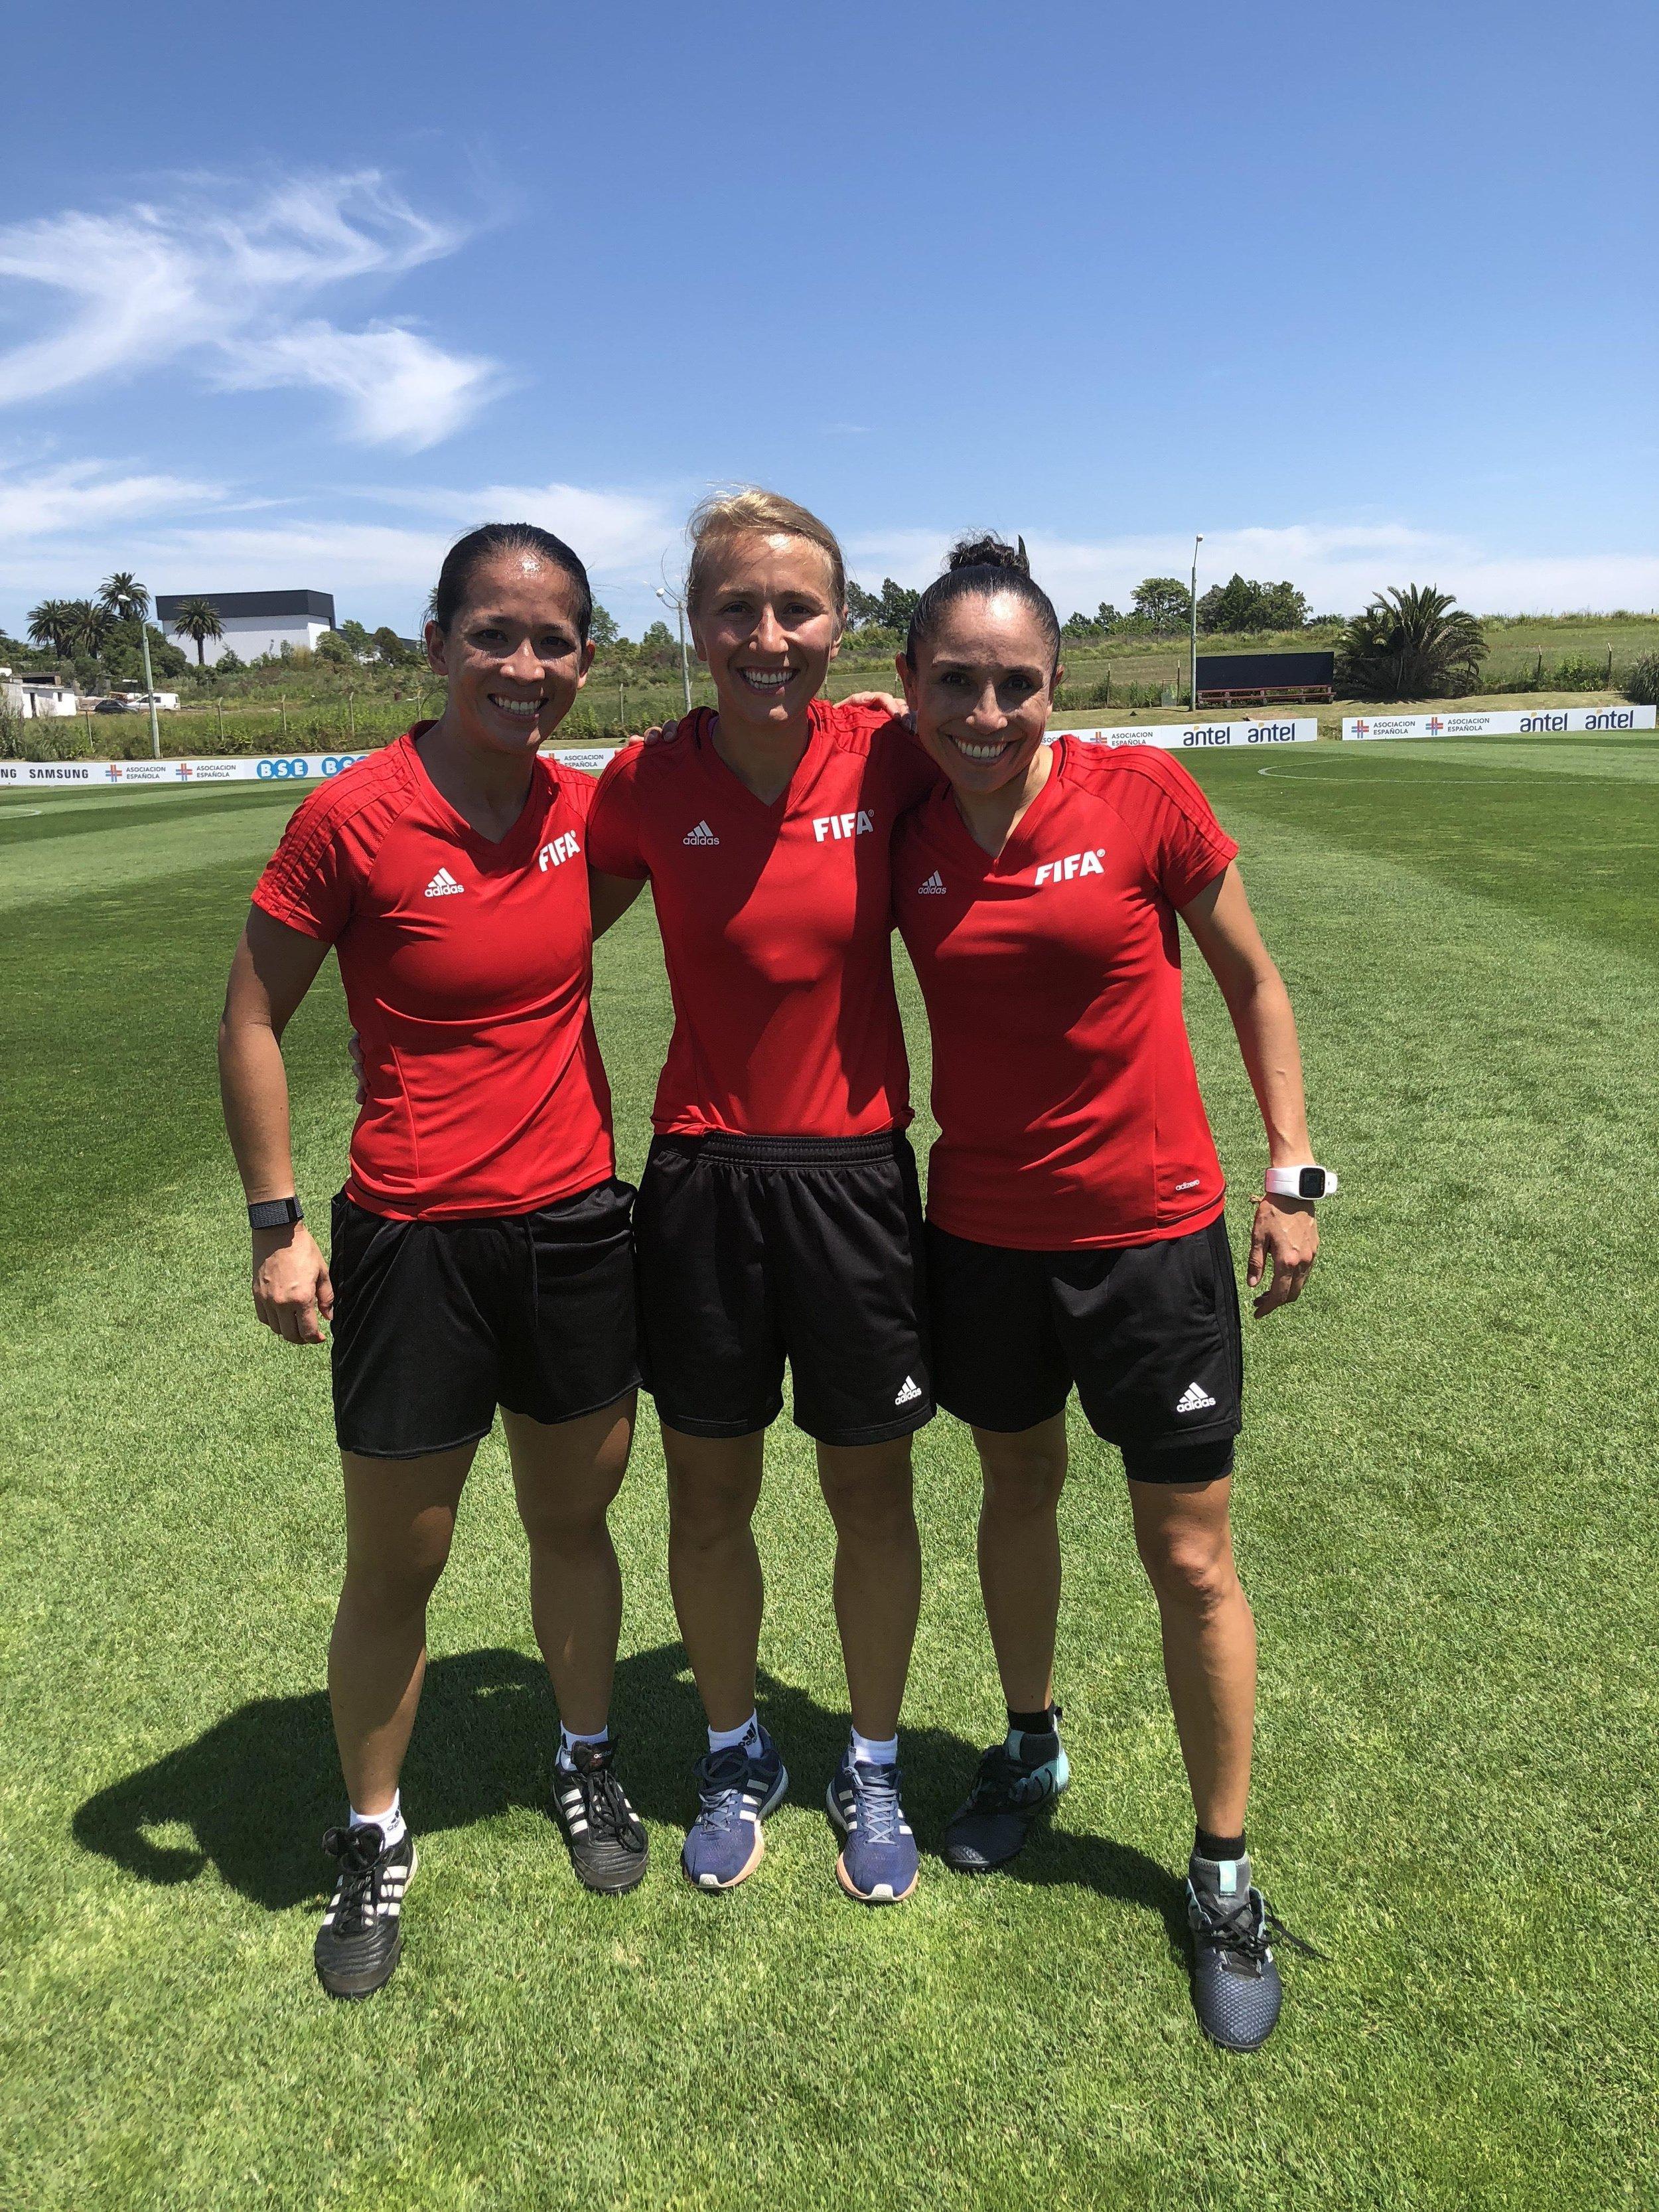 Deleana Quan, Ekaterina Koroleva and Felisha Mariscal representing the United States and the Women's U-17 World Cup in Uruguay.